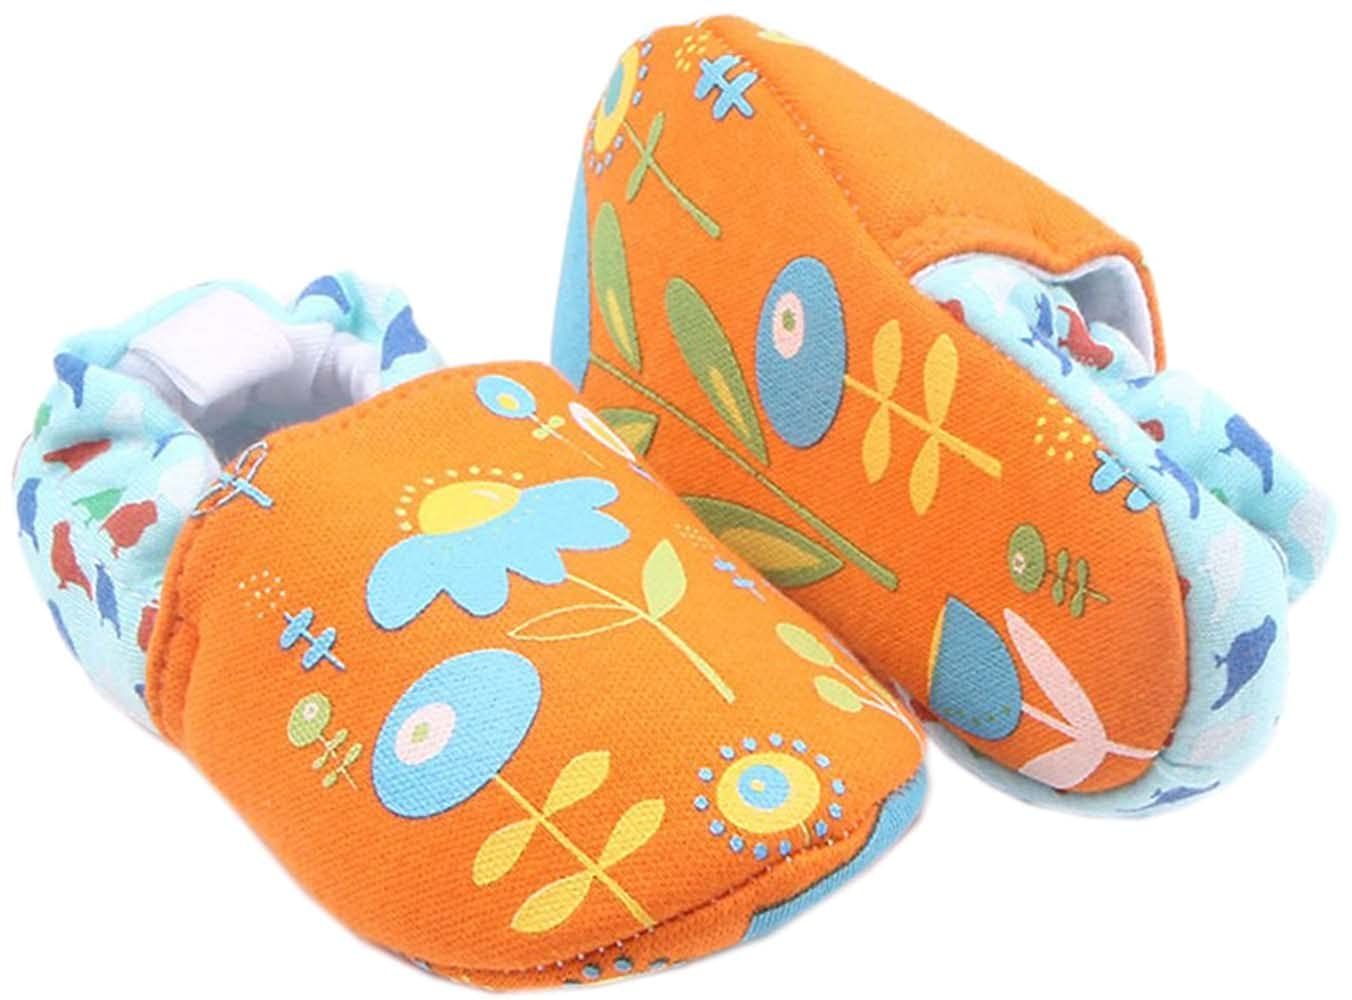 0-1 Year bettyhome Cotton Unisex Baby Newborn Lovely Flower Pattern Soft Sole Infant Toddler Prewalker Sneakers